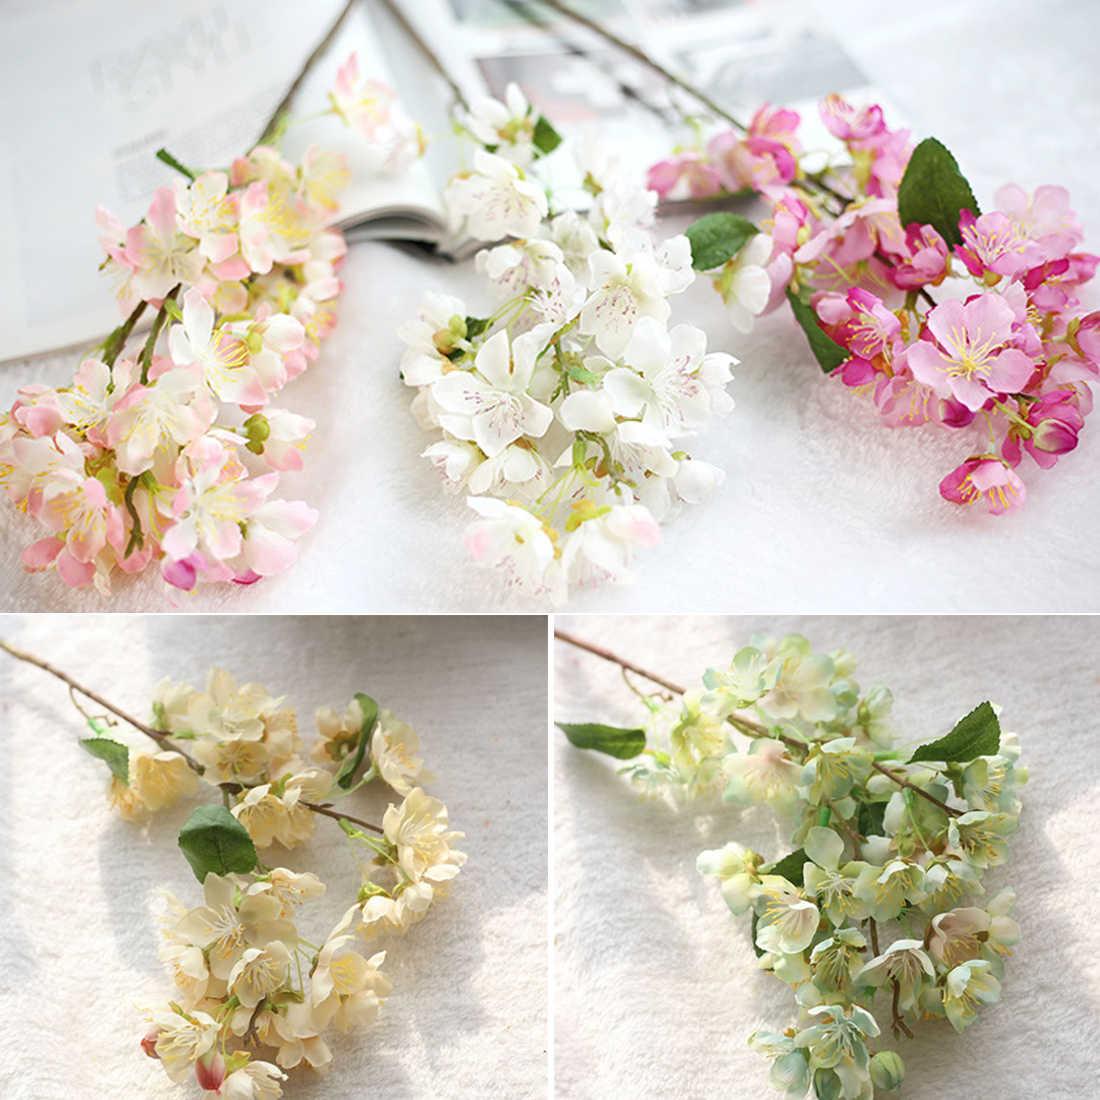 Jepang Sakura Bunga Buatan Cherry Blossom Kualitas Tinggi Bouquet Palsu Bunga Pohon Harapan Pernikahan Rumah Pesta Dekorasi